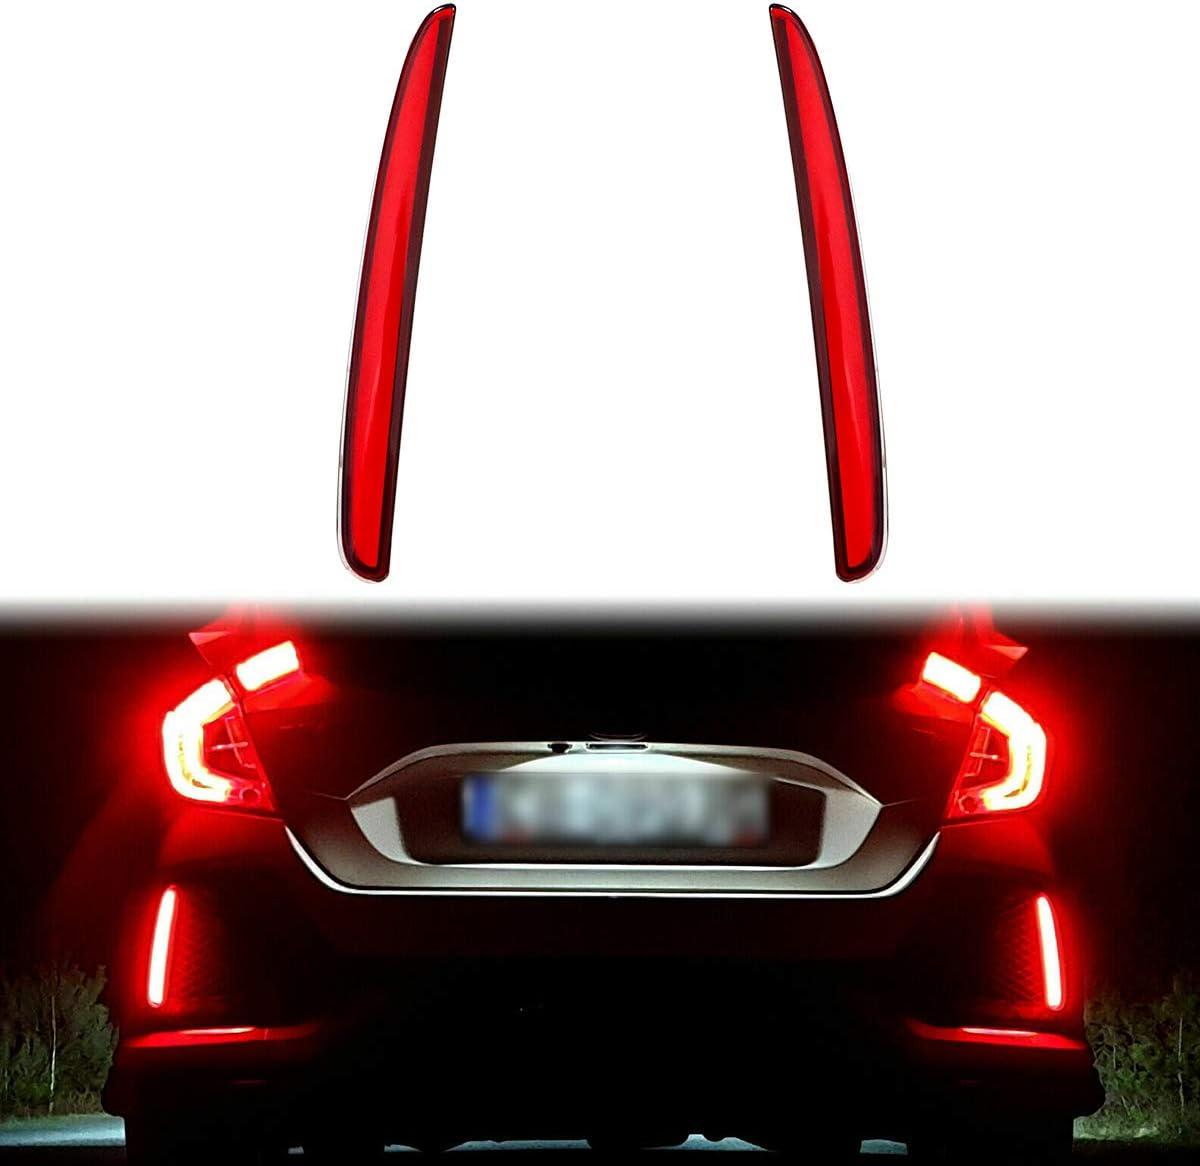 Type-R or SI 4-Door Sedan GTINTHEBOX Red Lens Full LED Bumper Reflector Lights Tail Brake Rear Fog Lamps for 2017-up Honda Civic Hatchback